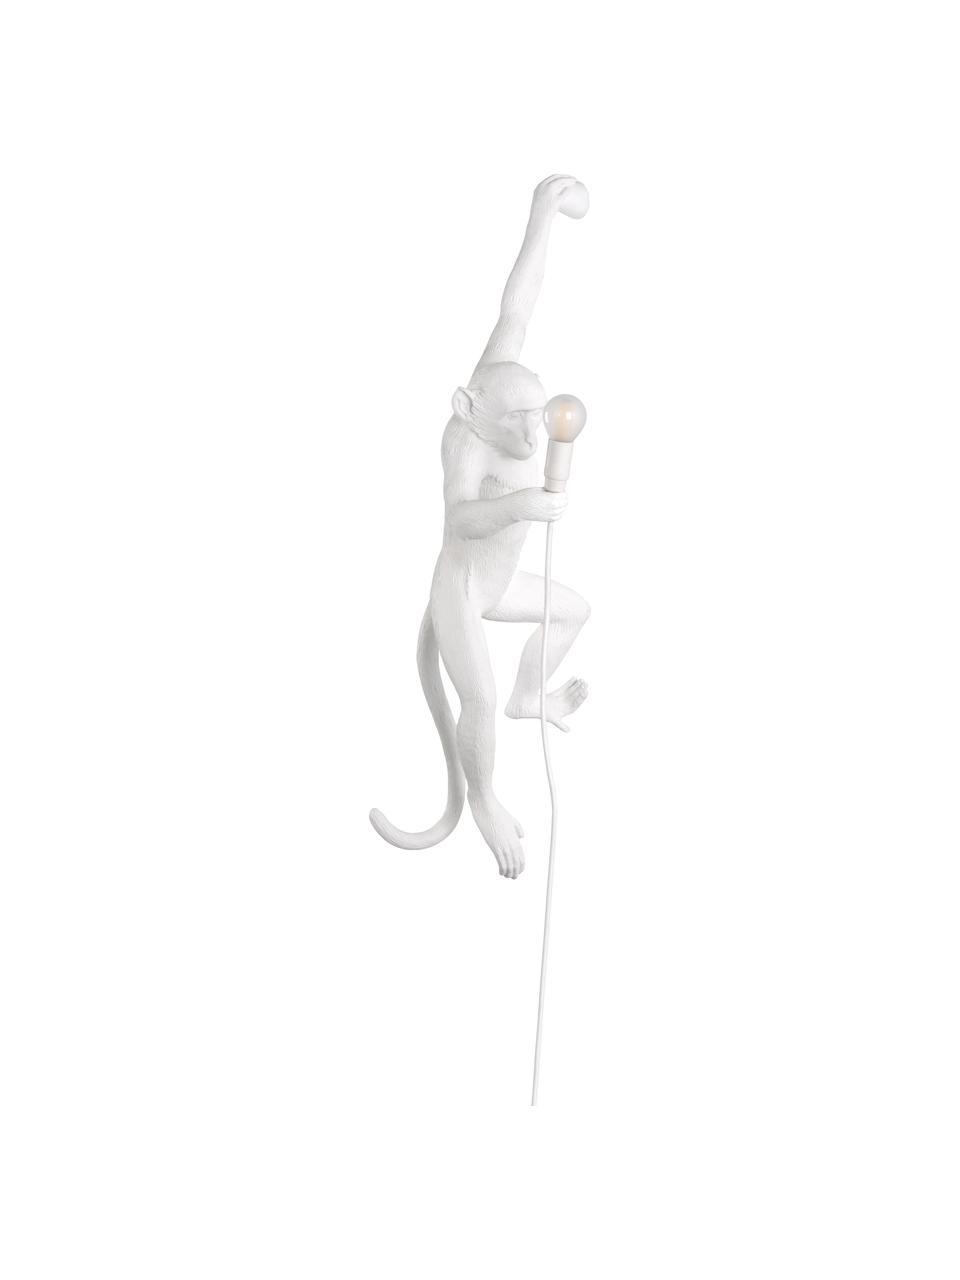 Lampada con spina di design Monkey, Lampada: resina sintetica, Bianco, Larg. 77 x Alt. 37 cm